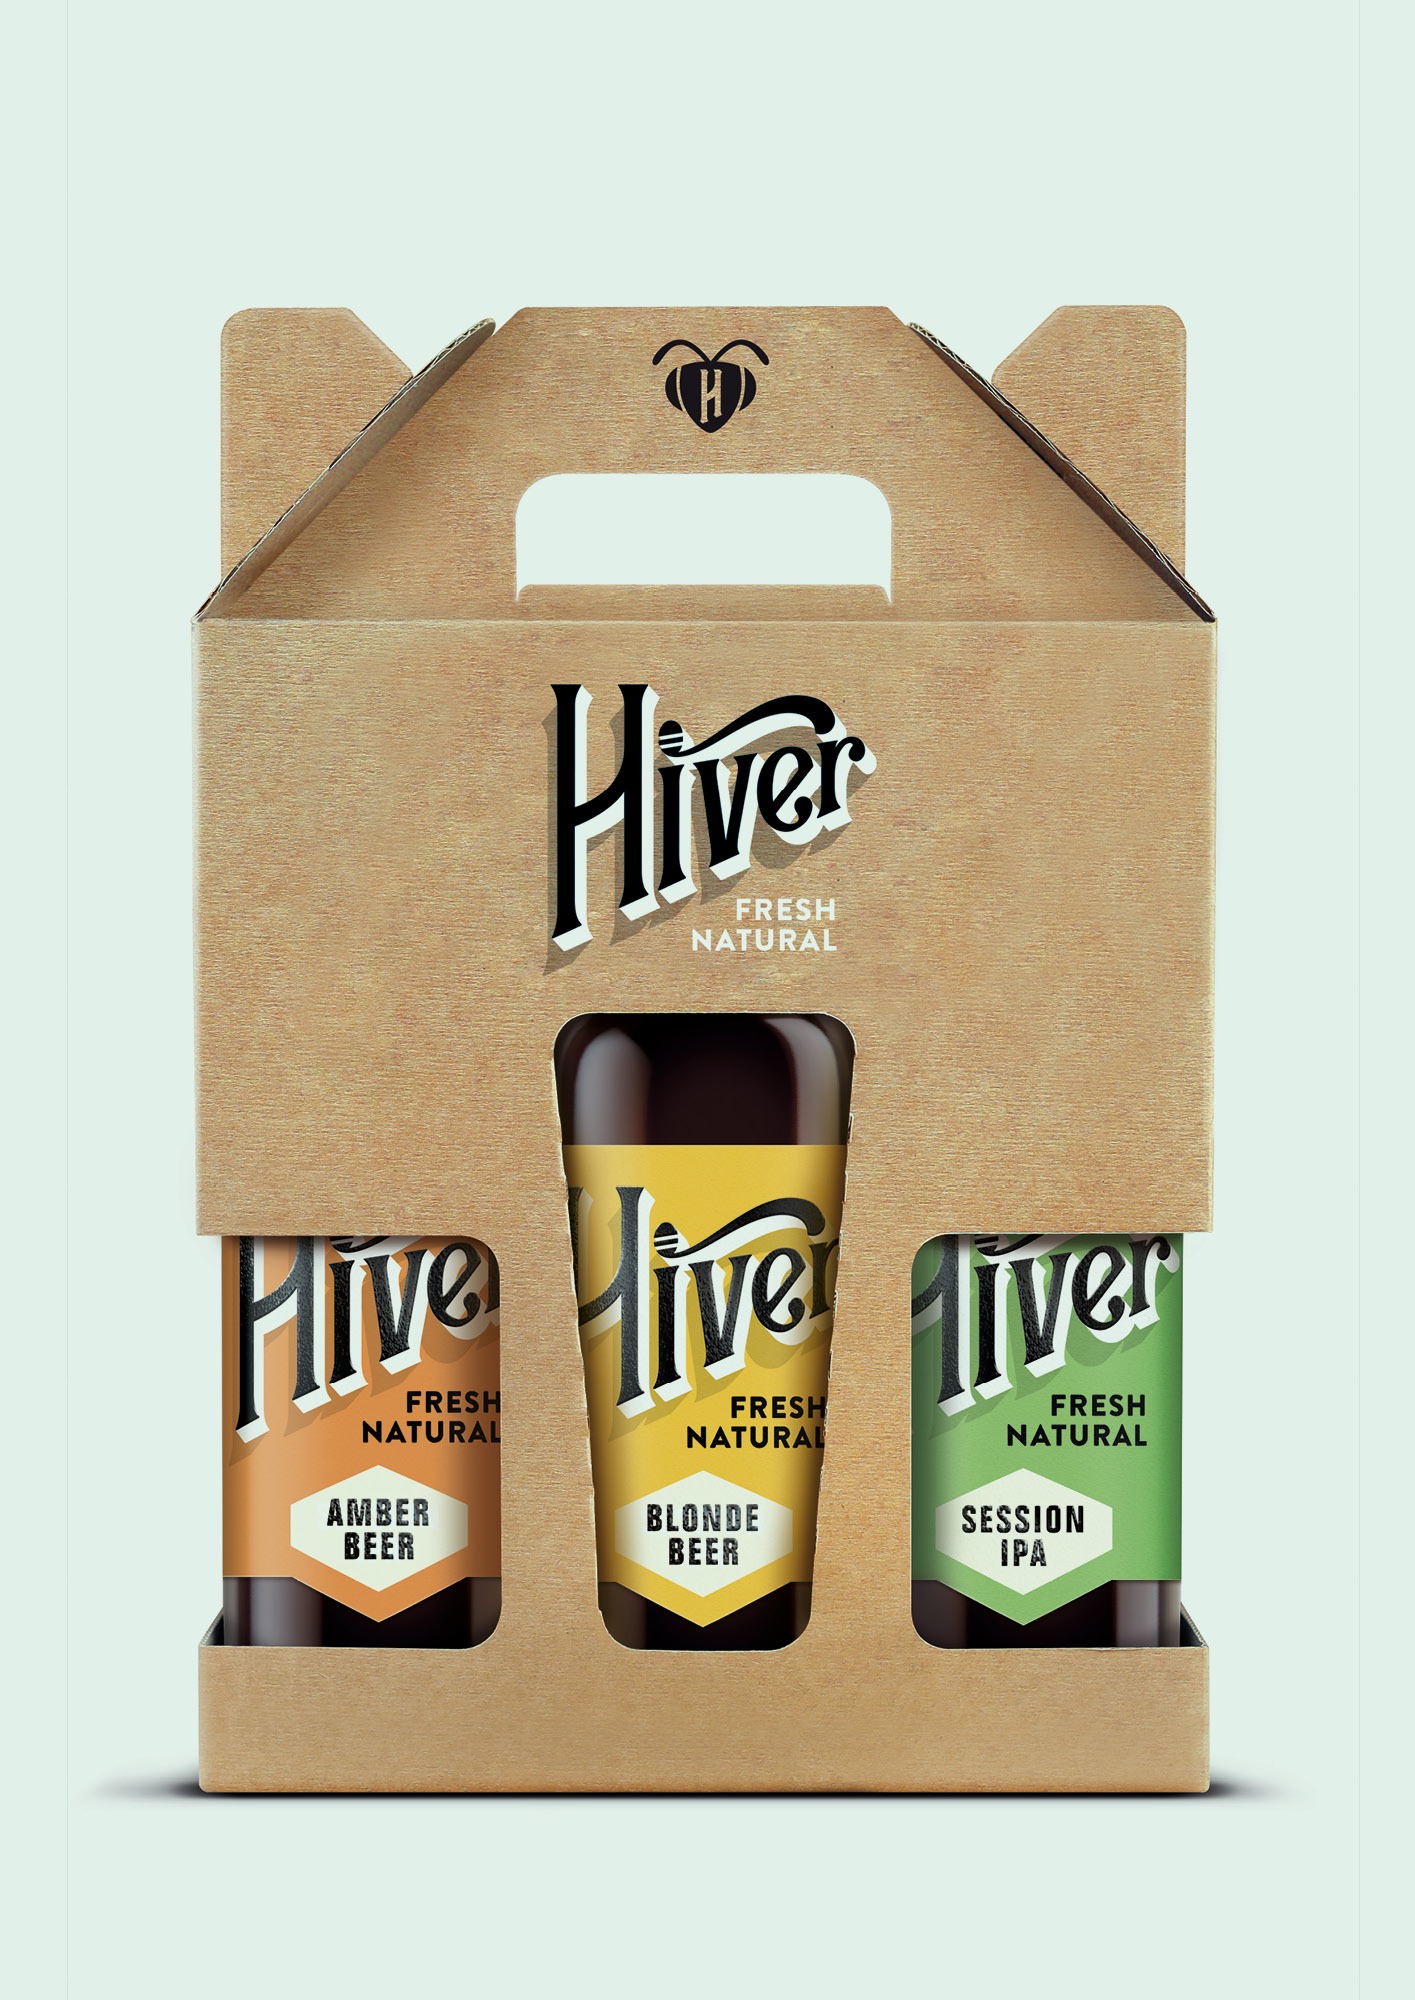 The Hiver range of beers